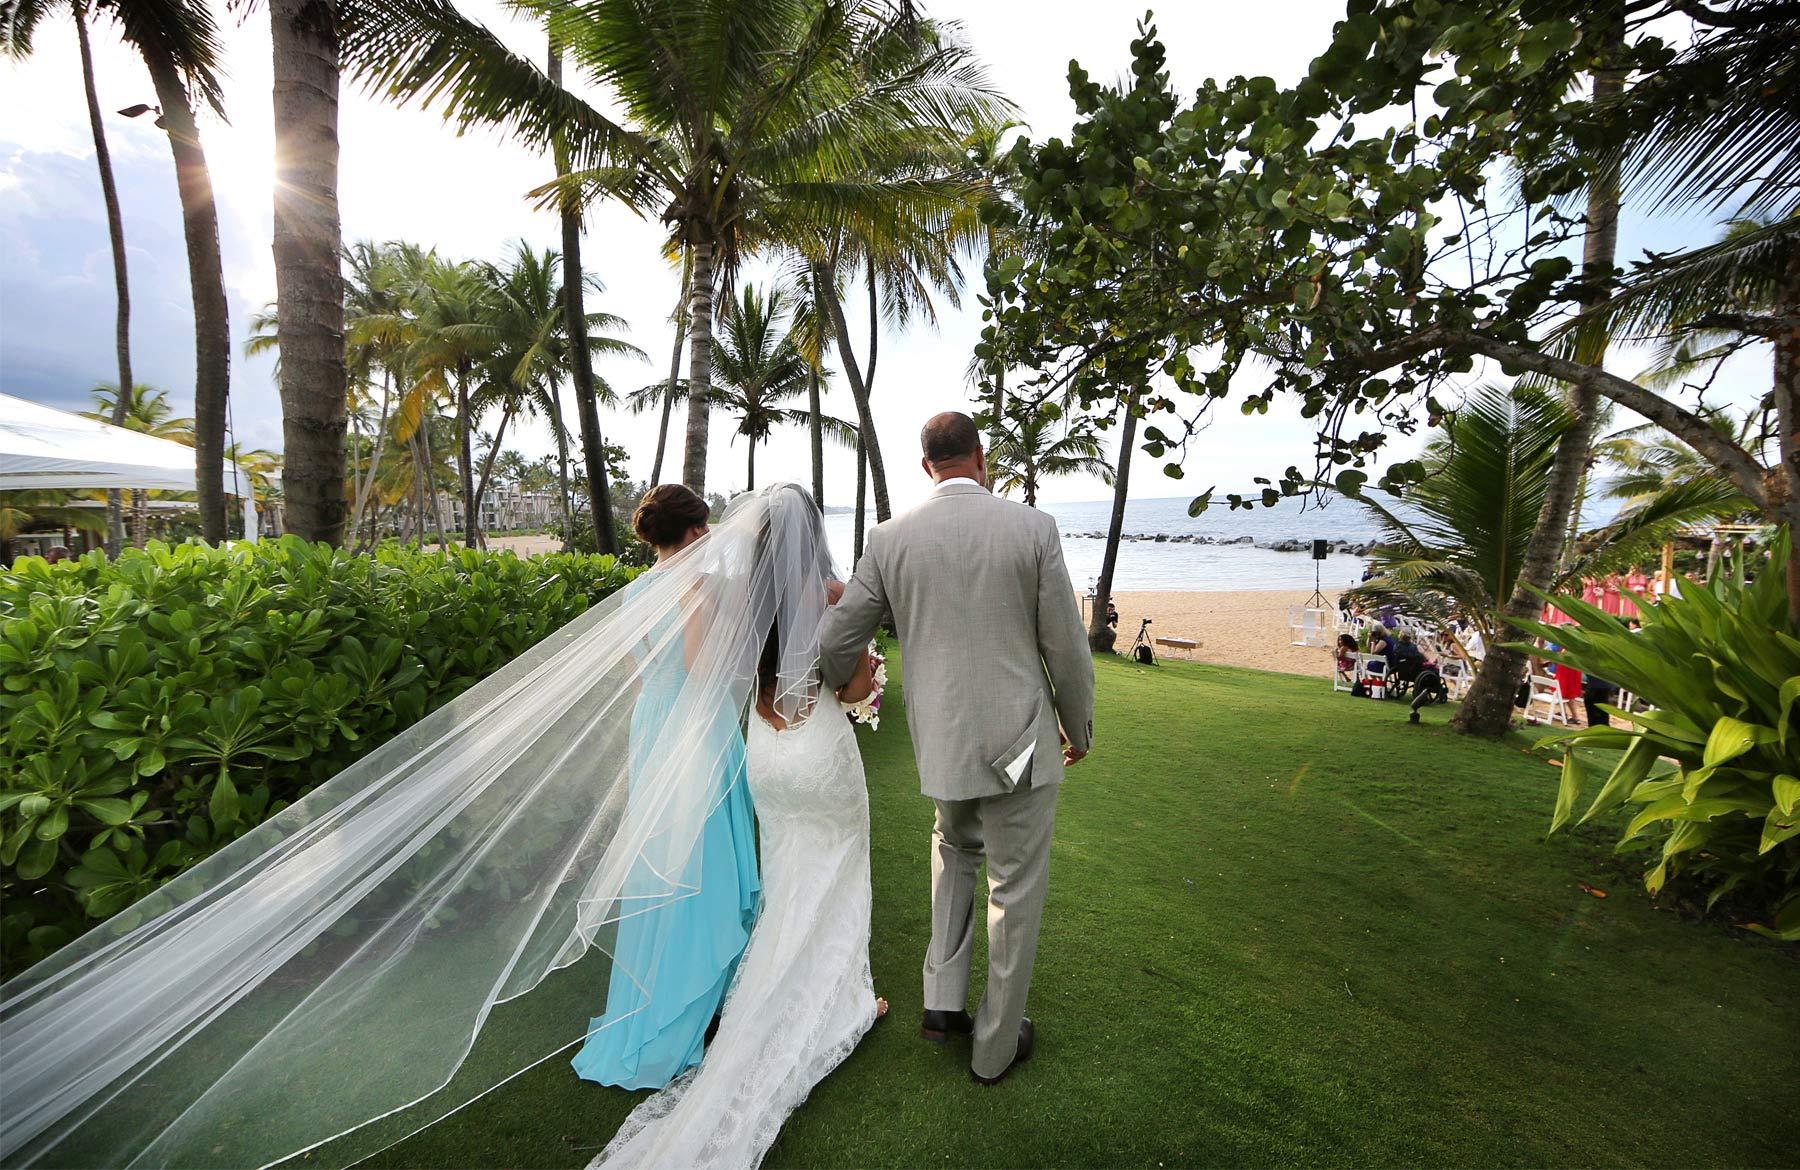 10-Puerto-Rico-Wedding-Photography-by-Vick-Photography-Destination-Wedding-Island-Tropical-Paradise-Resort-Ceremony-Aisle-Chanel-and-Sam.jpg